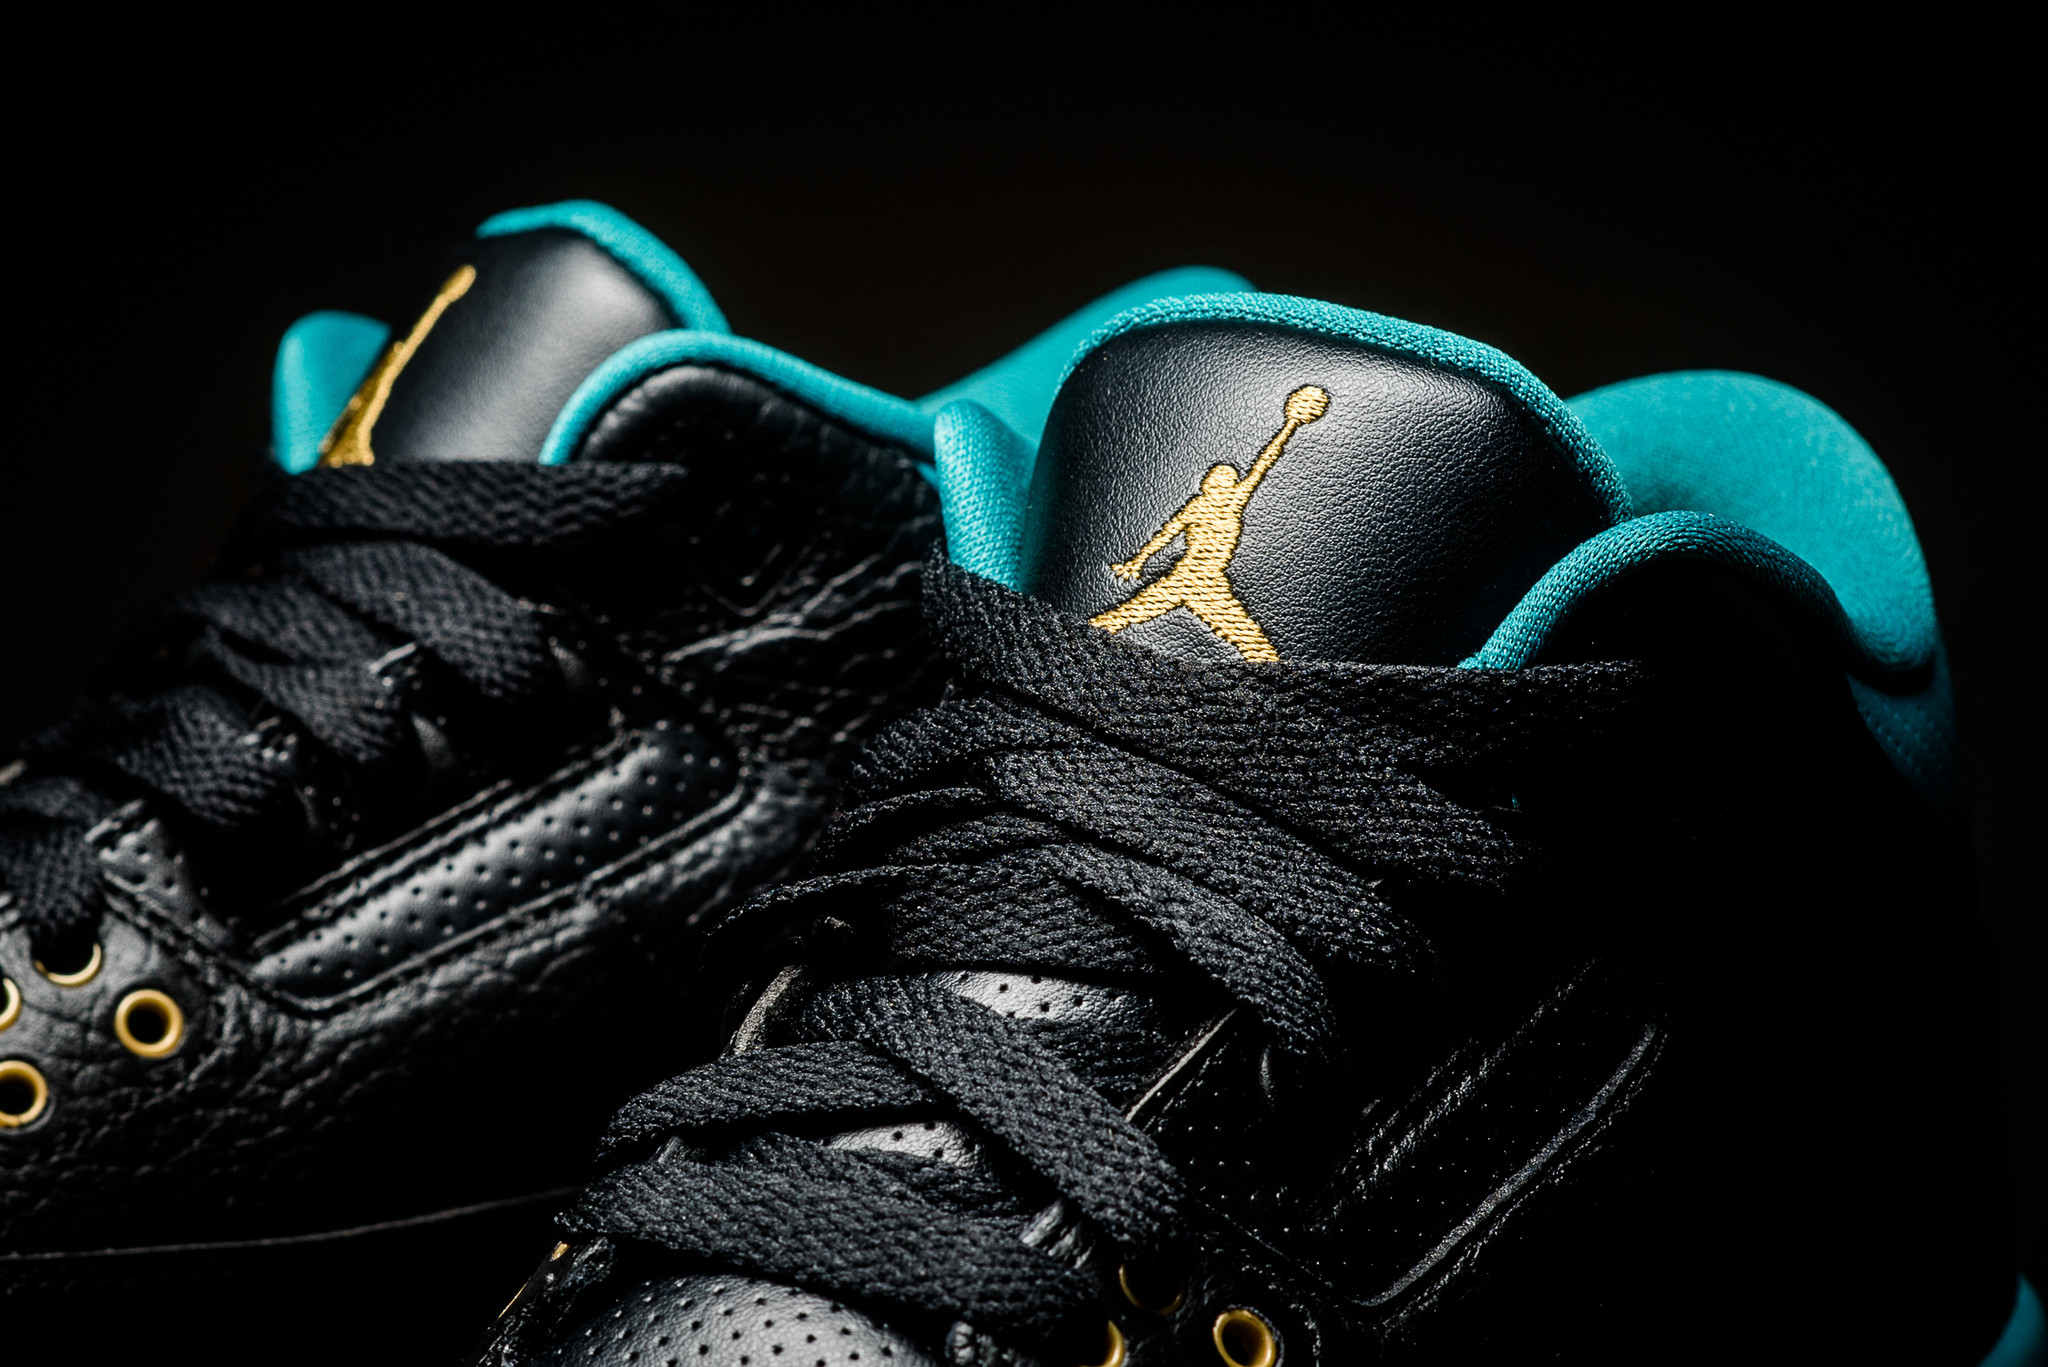 buy popular 2b289 5ffef Air Jordan 3 GS Jaguars Release Date 441140-018 | Sole Collector